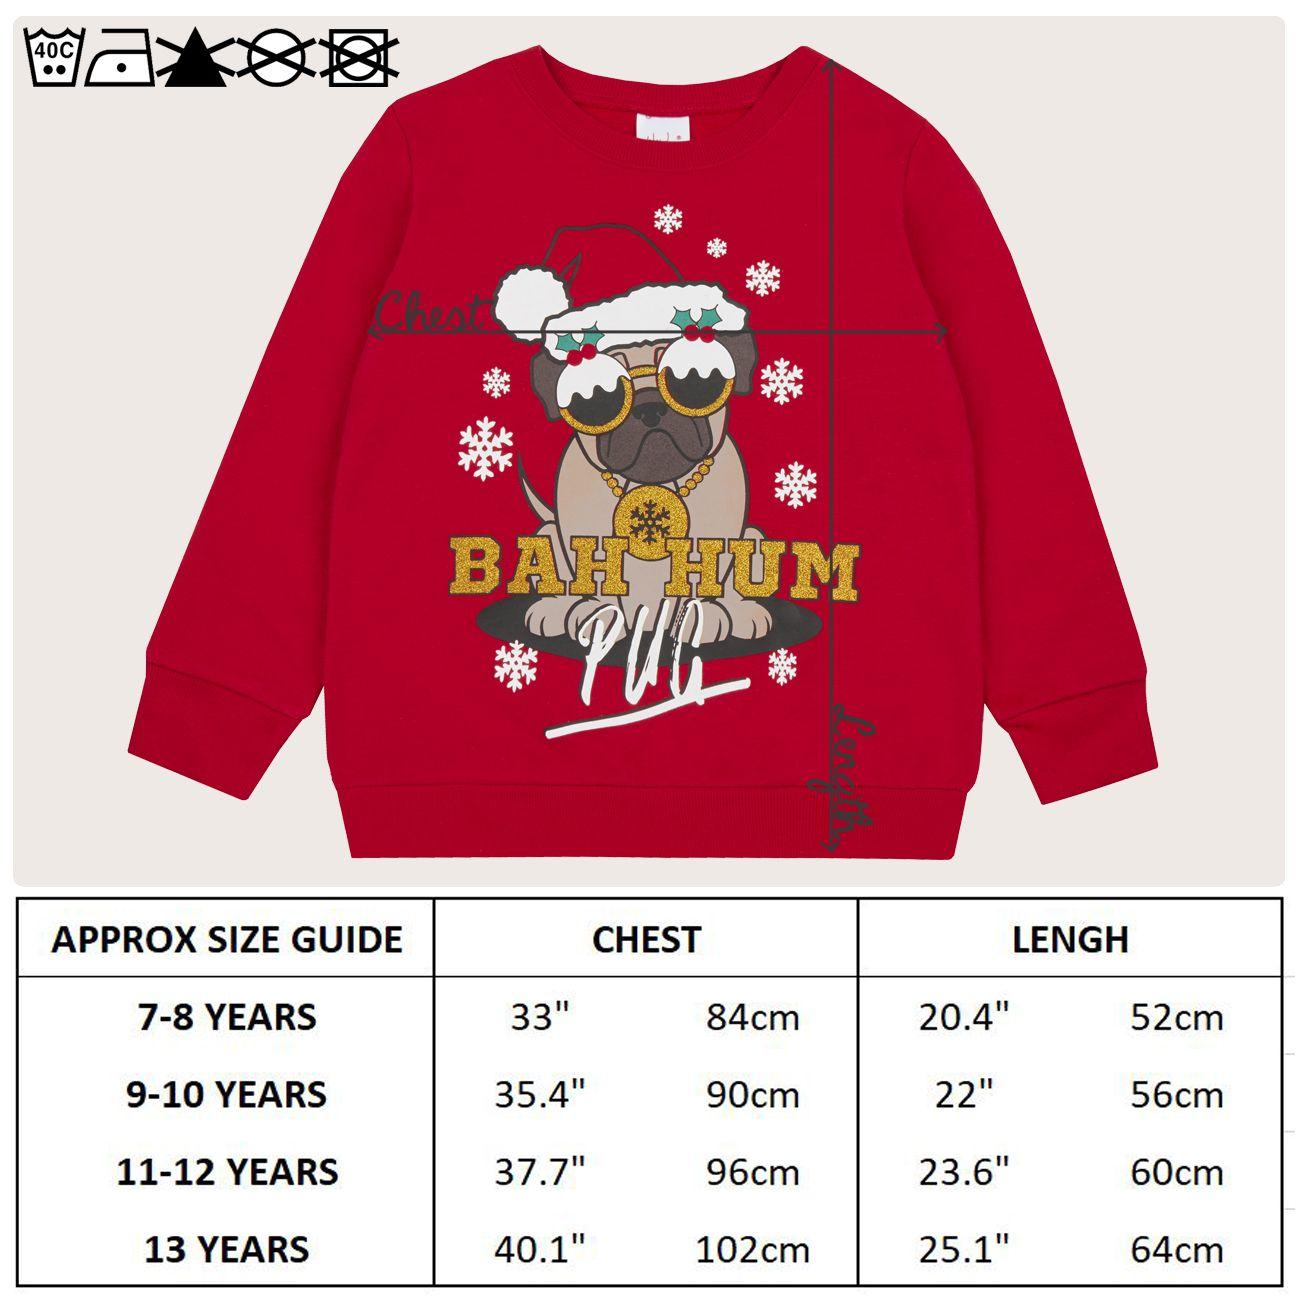 Enfants-Garcons-Filles-Noel-Noel-Pull-Sweat-shirt-Carlin-Glitter-chaud miniature 8